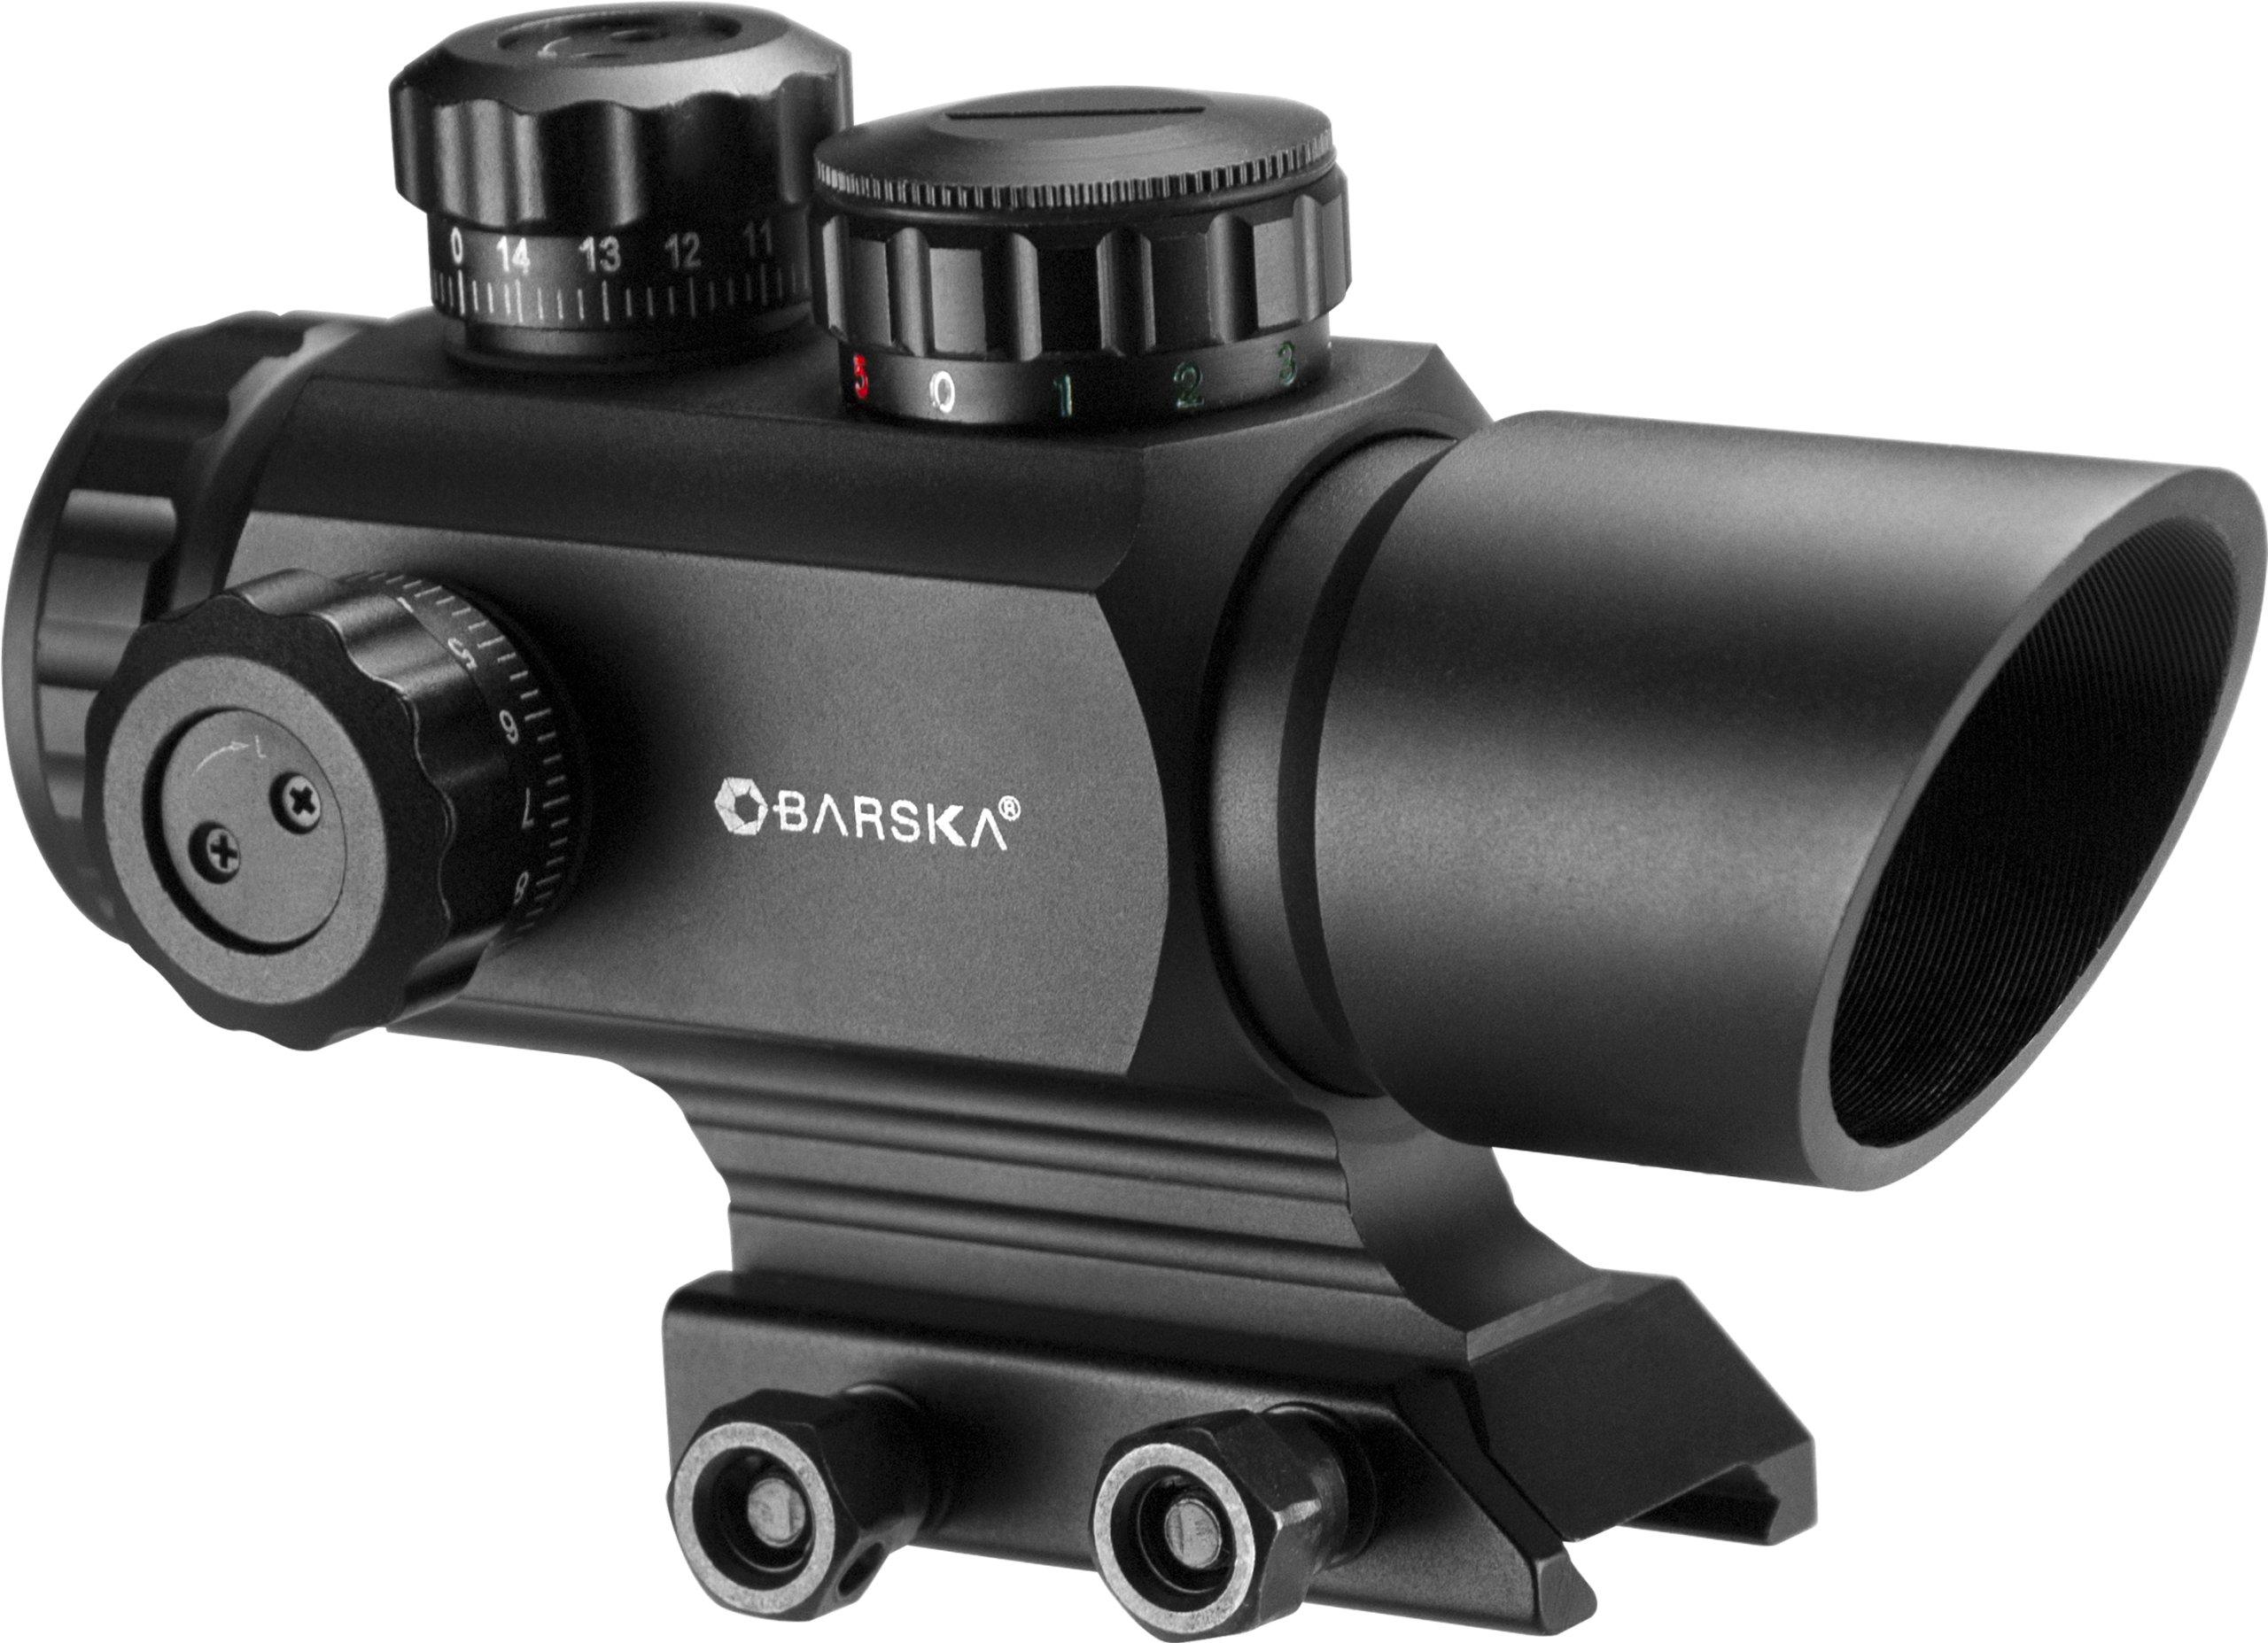 BARSKA AC12176 ARX Multi Reticle Red Dot Optics, 1x 35mm, Matte Black